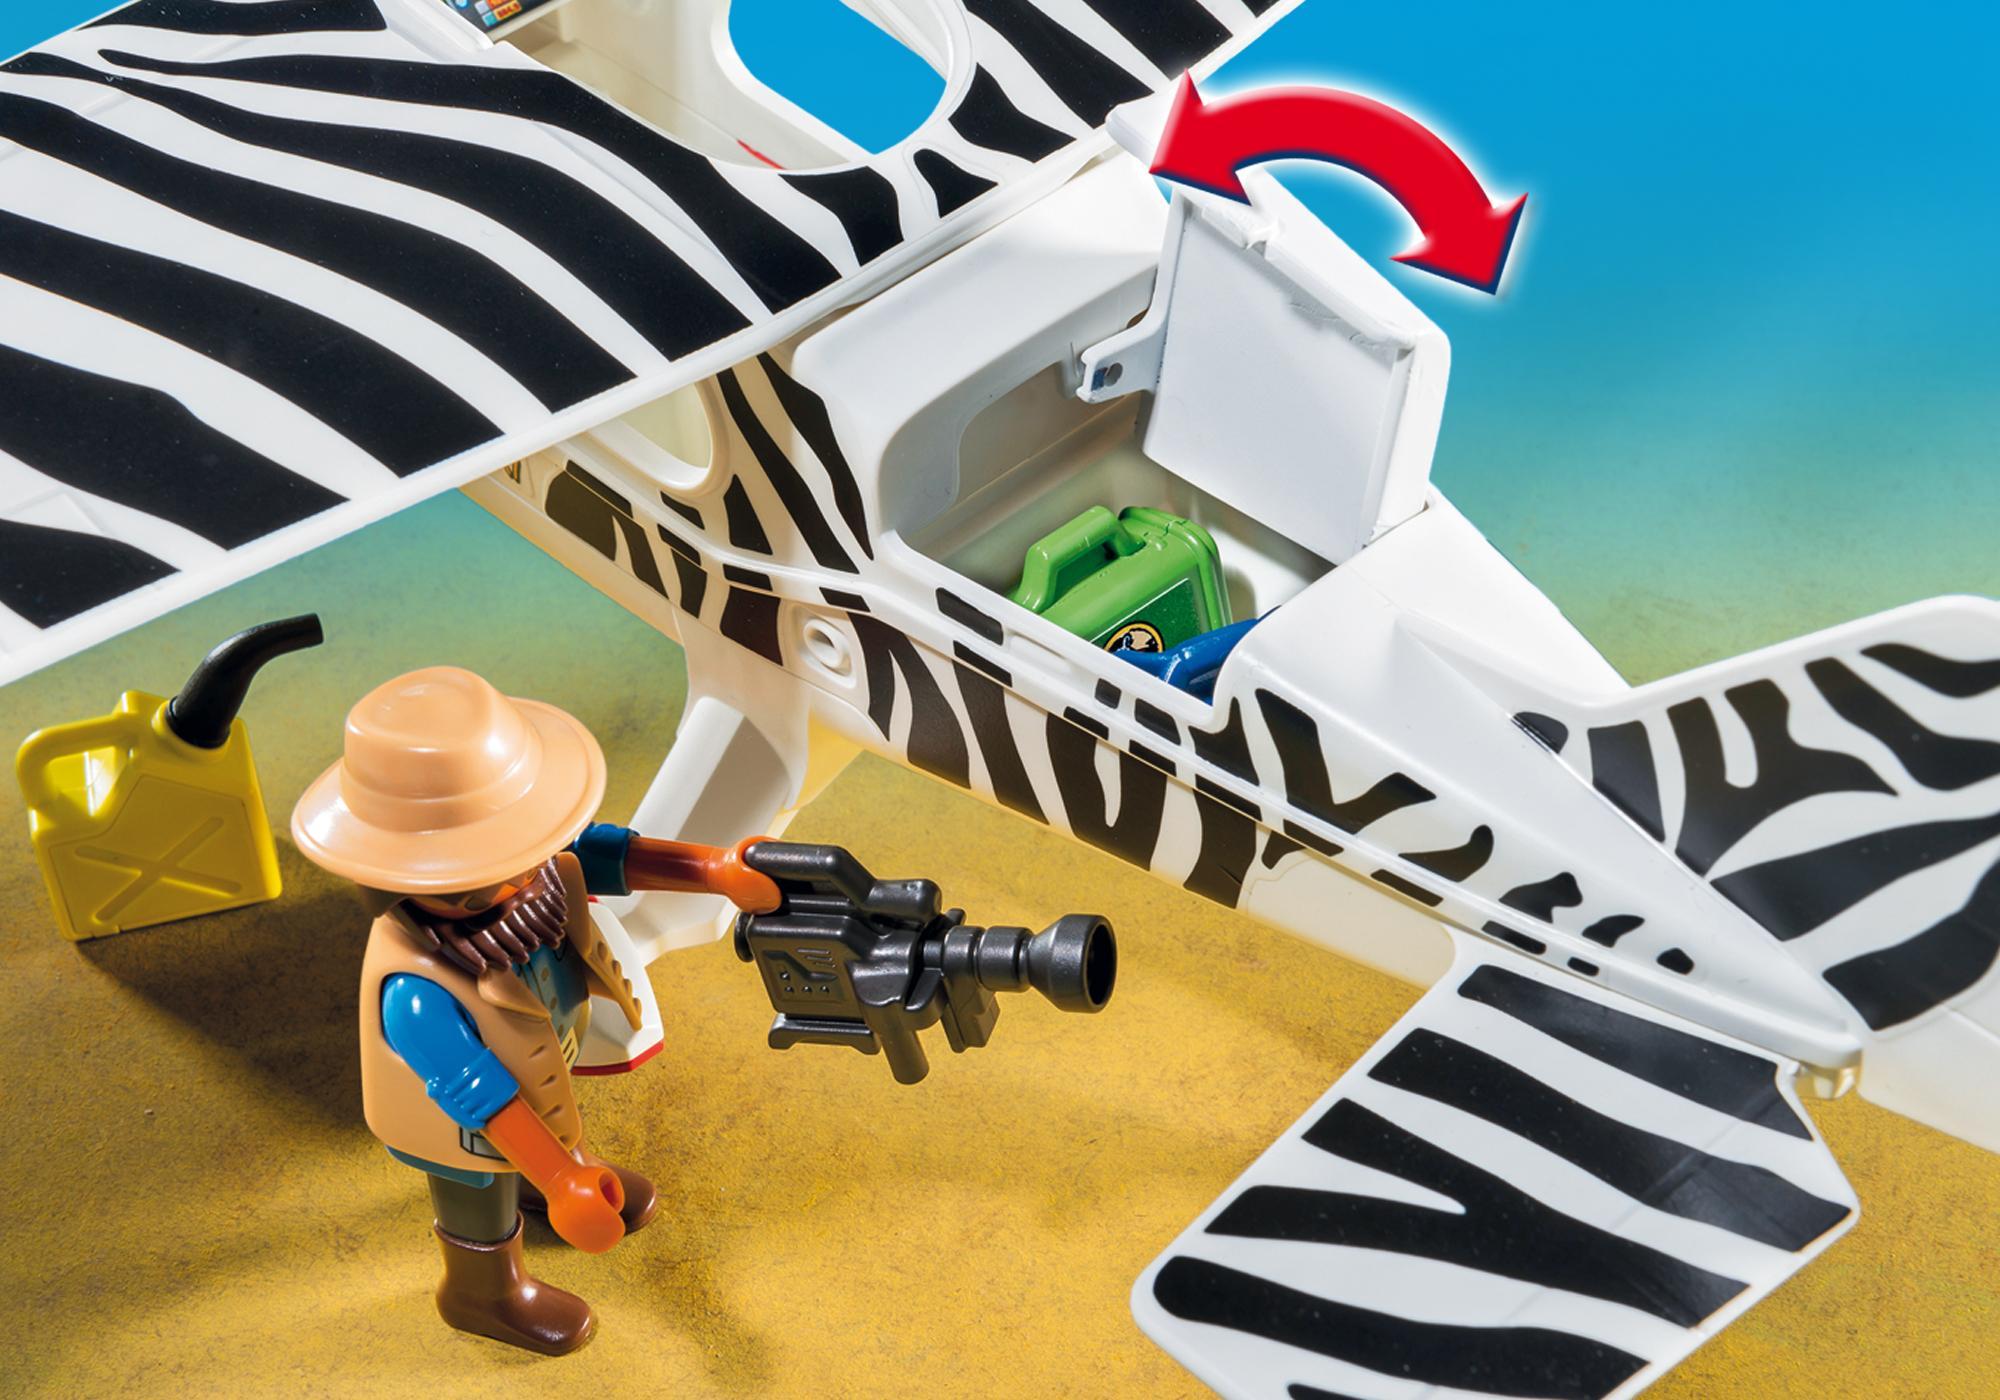 http://media.playmobil.com/i/playmobil/6938_product_extra1/Safariflygplan